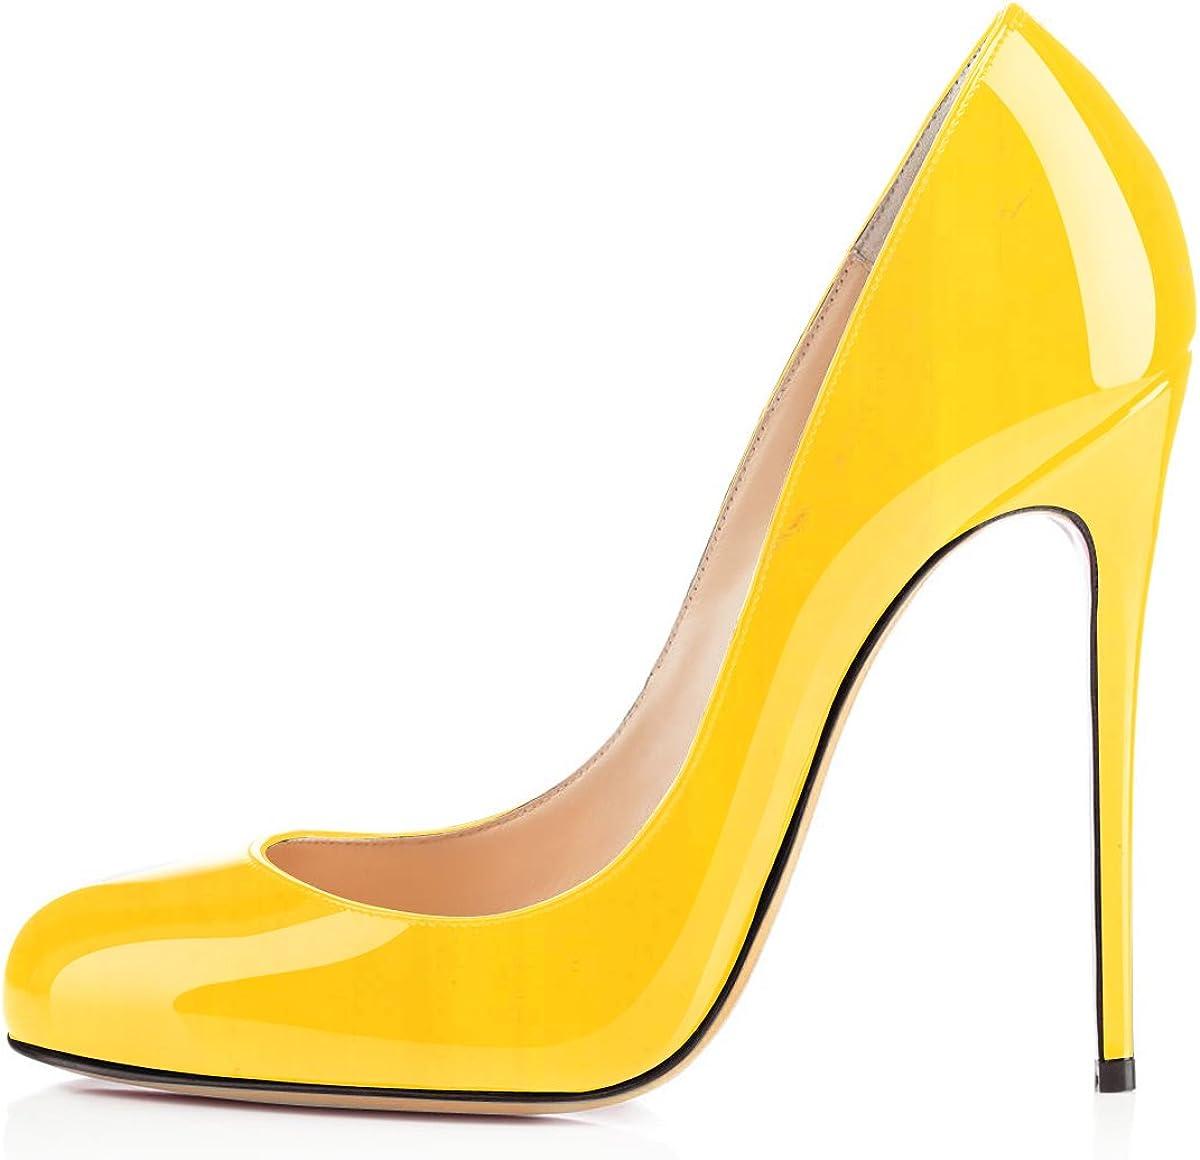 Soireelady Womens Ladies 12CM High Heels Smart Round Toe Court Shoes